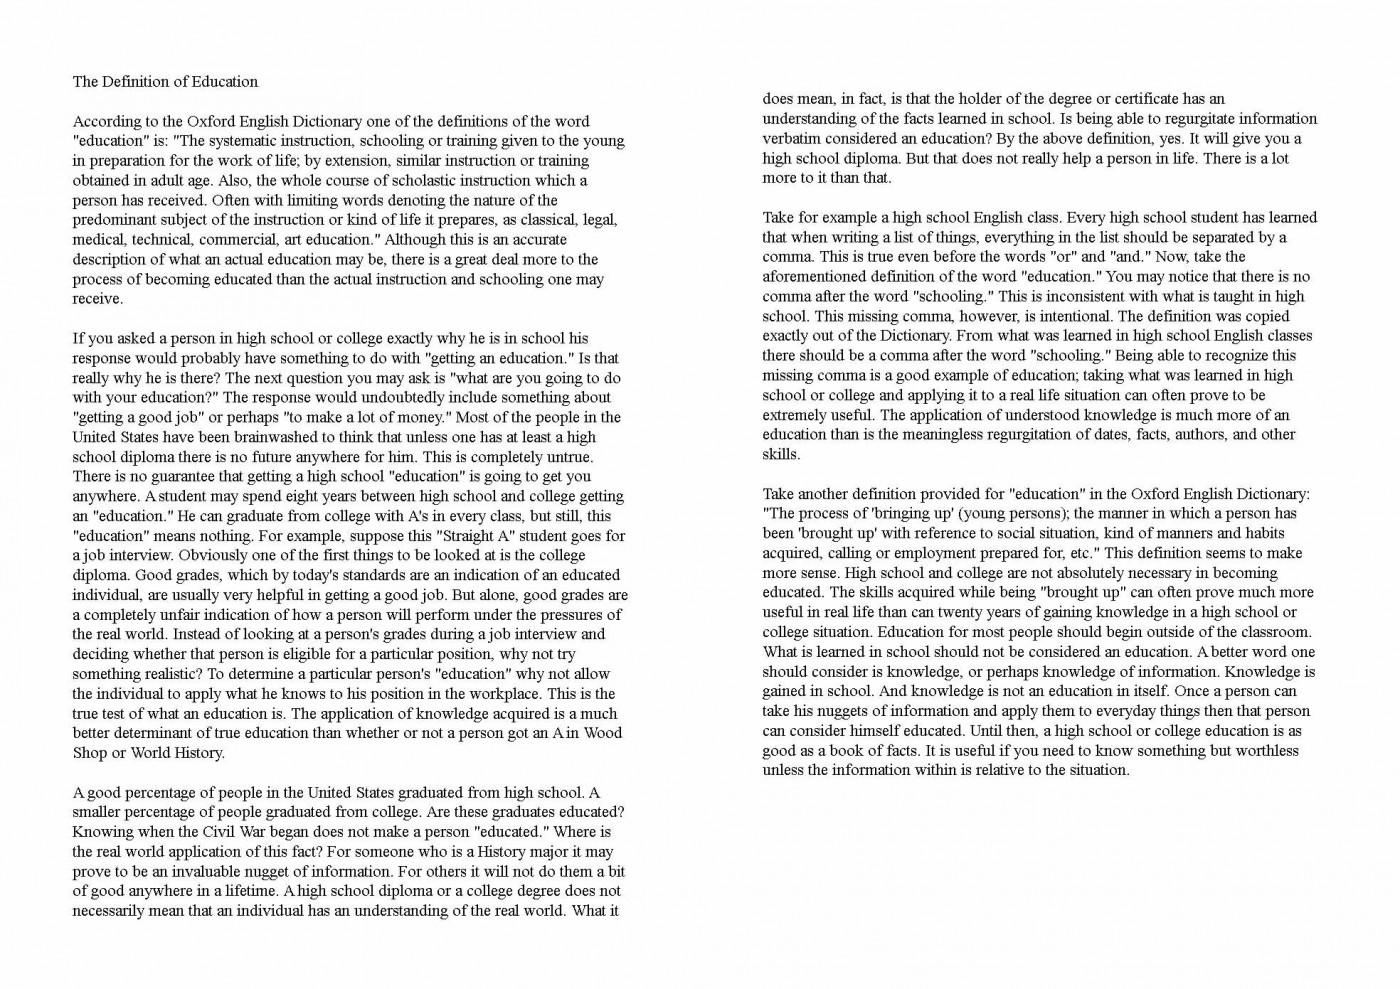 006 To Kill Mockingbird Worksheets Beautiful Essay On